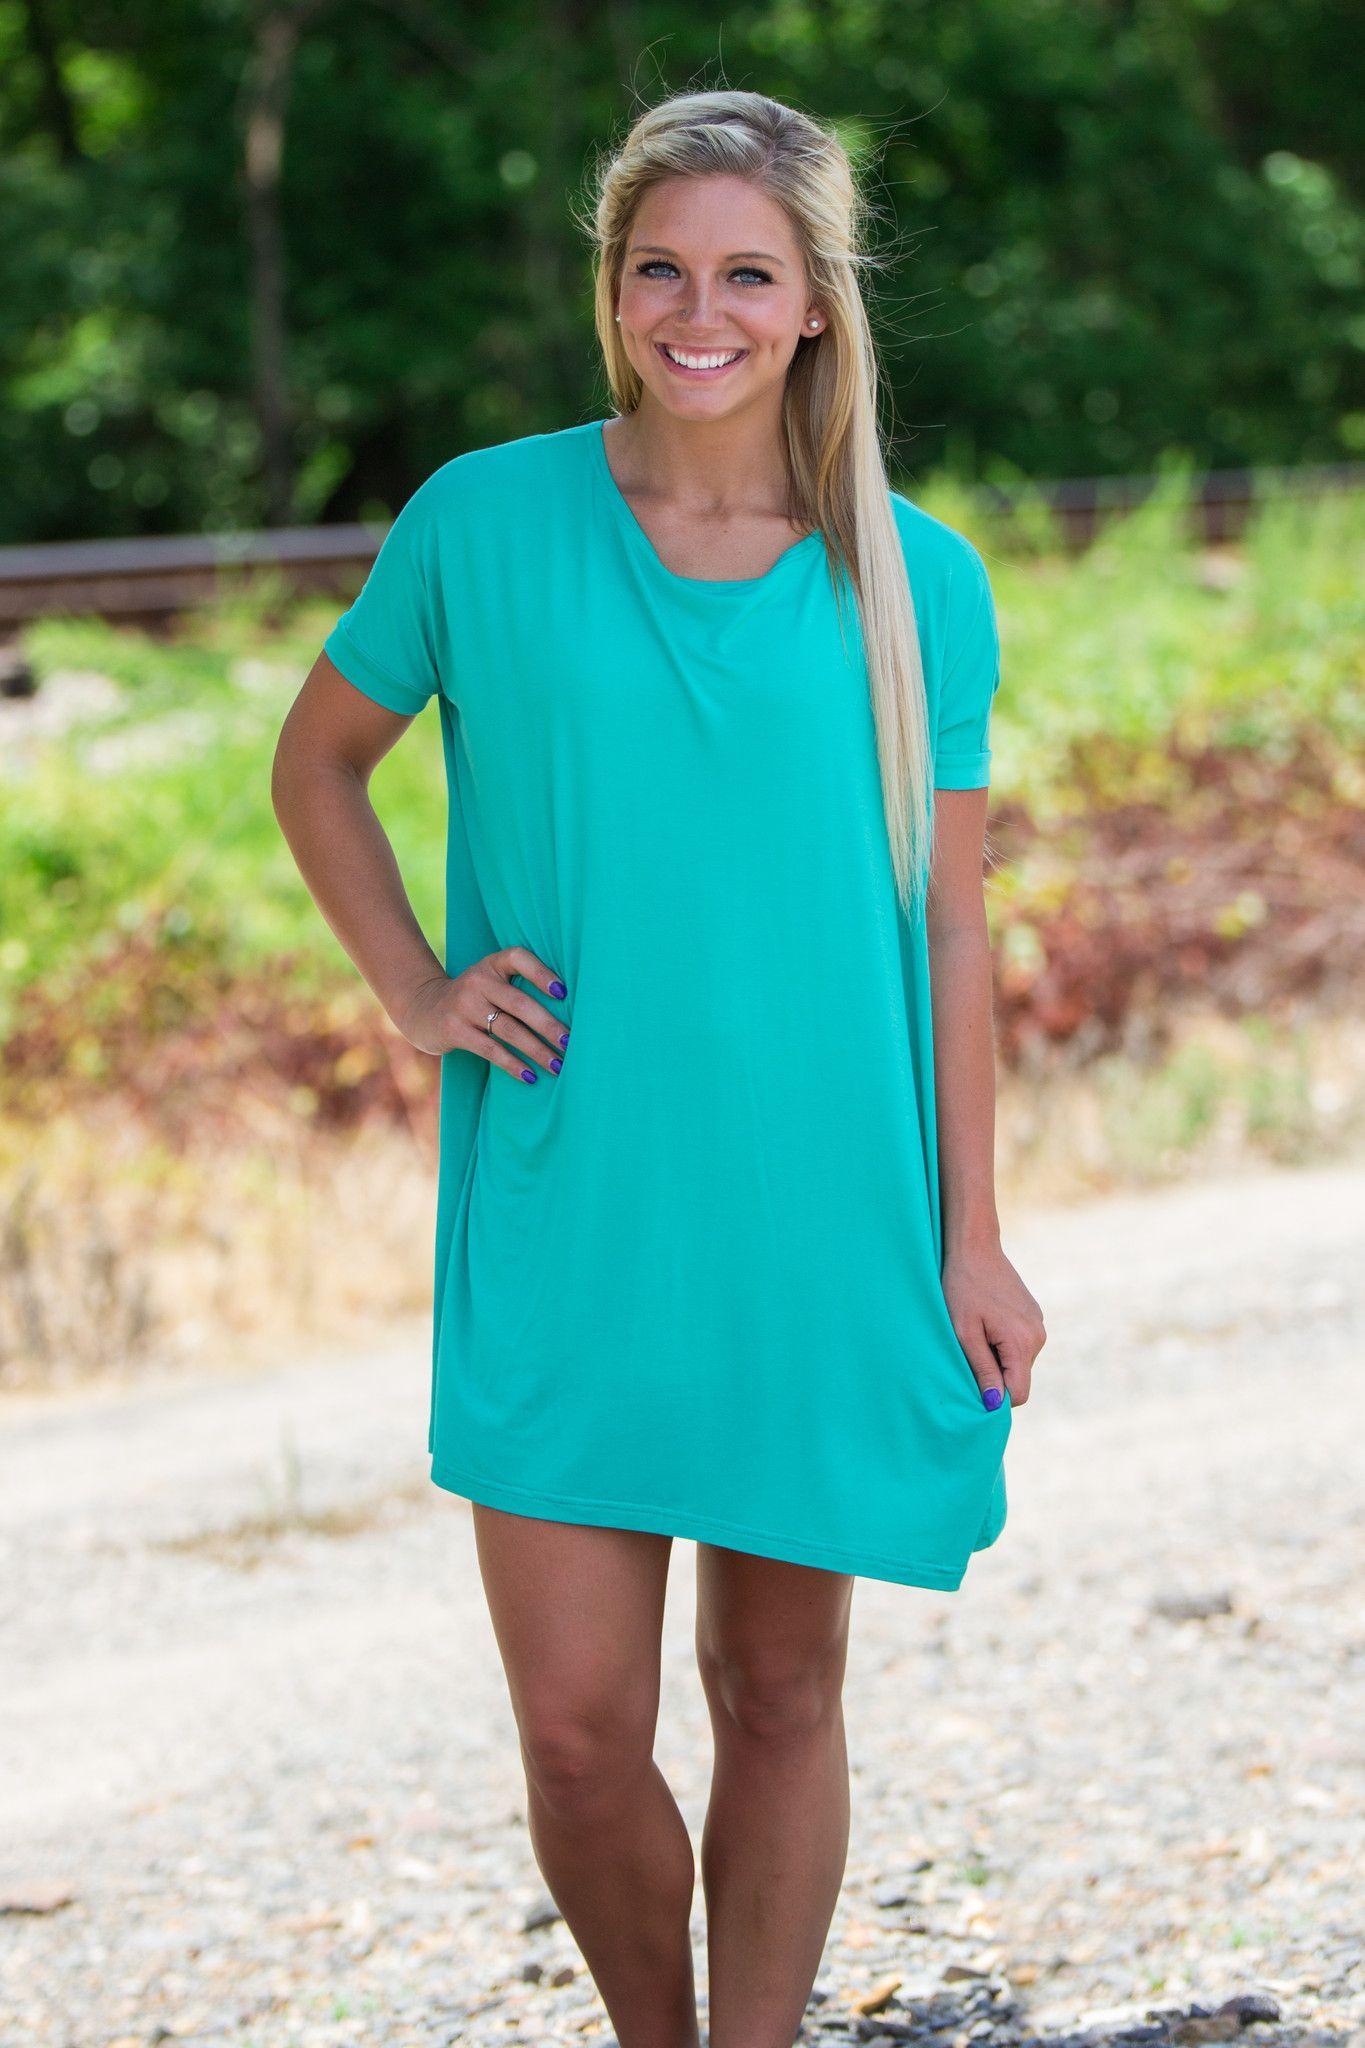 eb7aa50b10d Half Sleeve Piko Tunic - Light Green | Summer outfit | Sleeves, Half ...